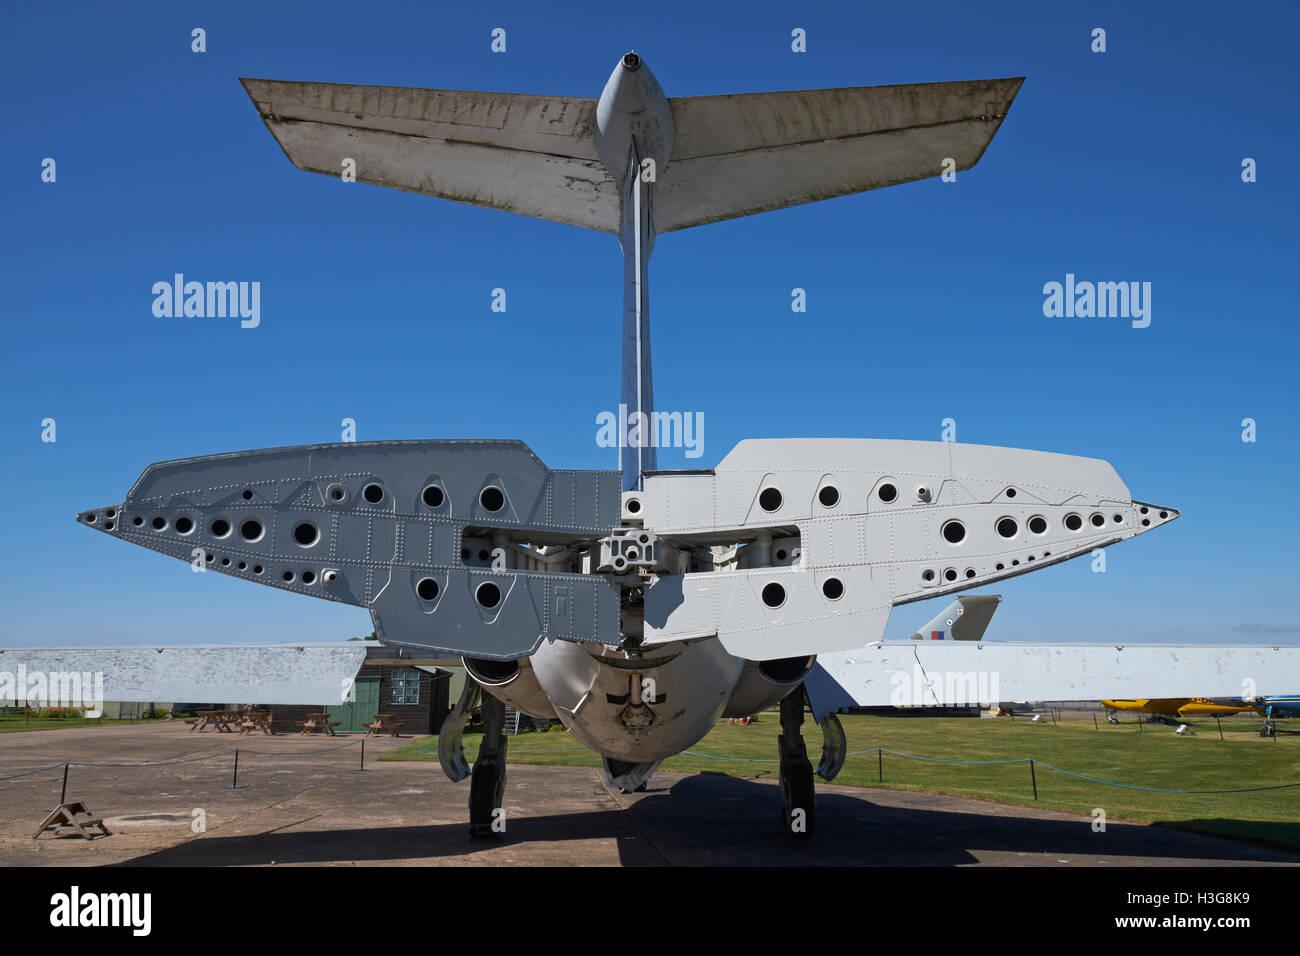 1952 Farnborough Airshow crash